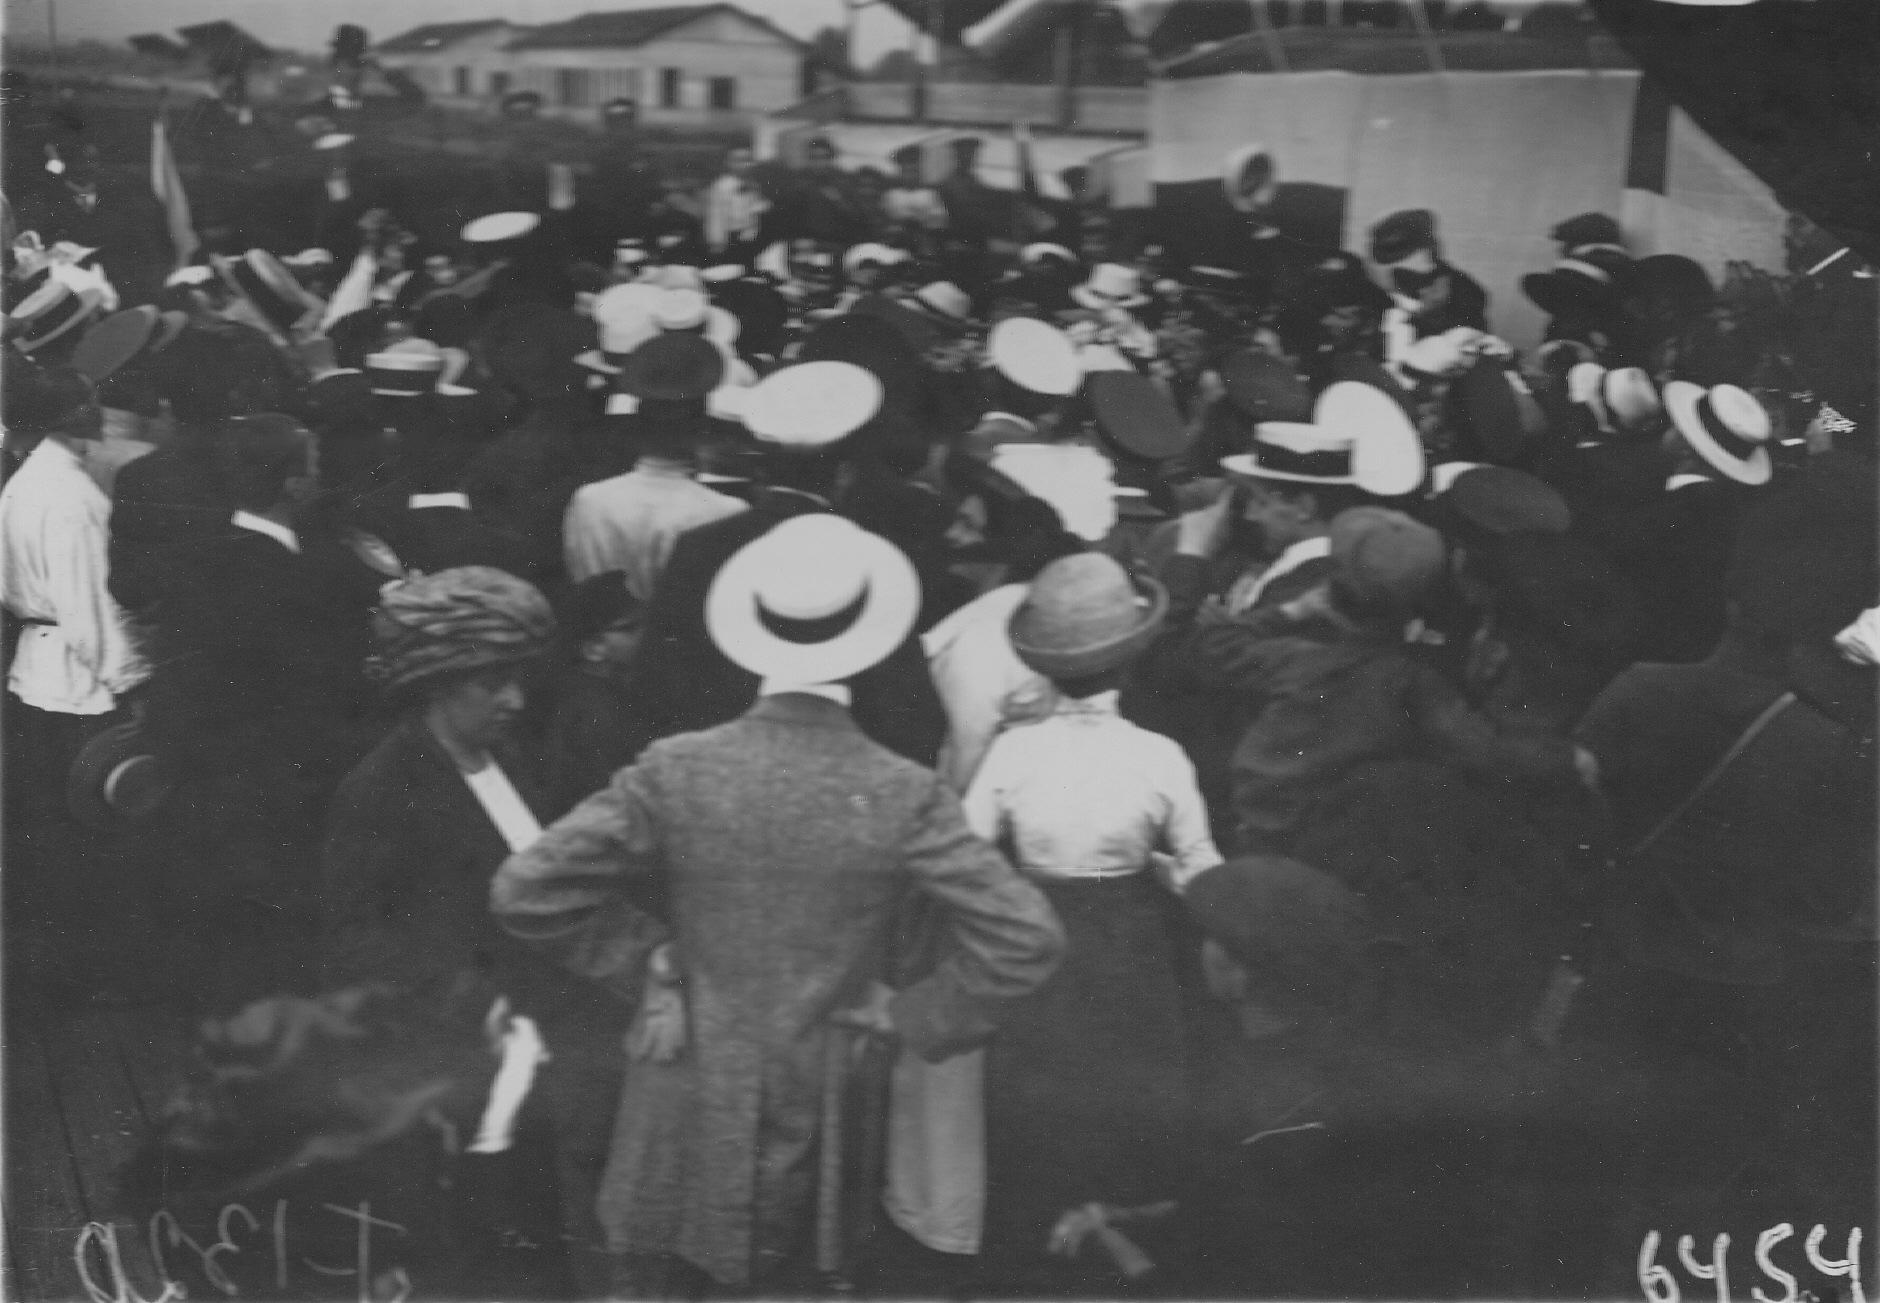 15. Летчик В.М.Абрамович среди друзей и публики после полета на аэродроме